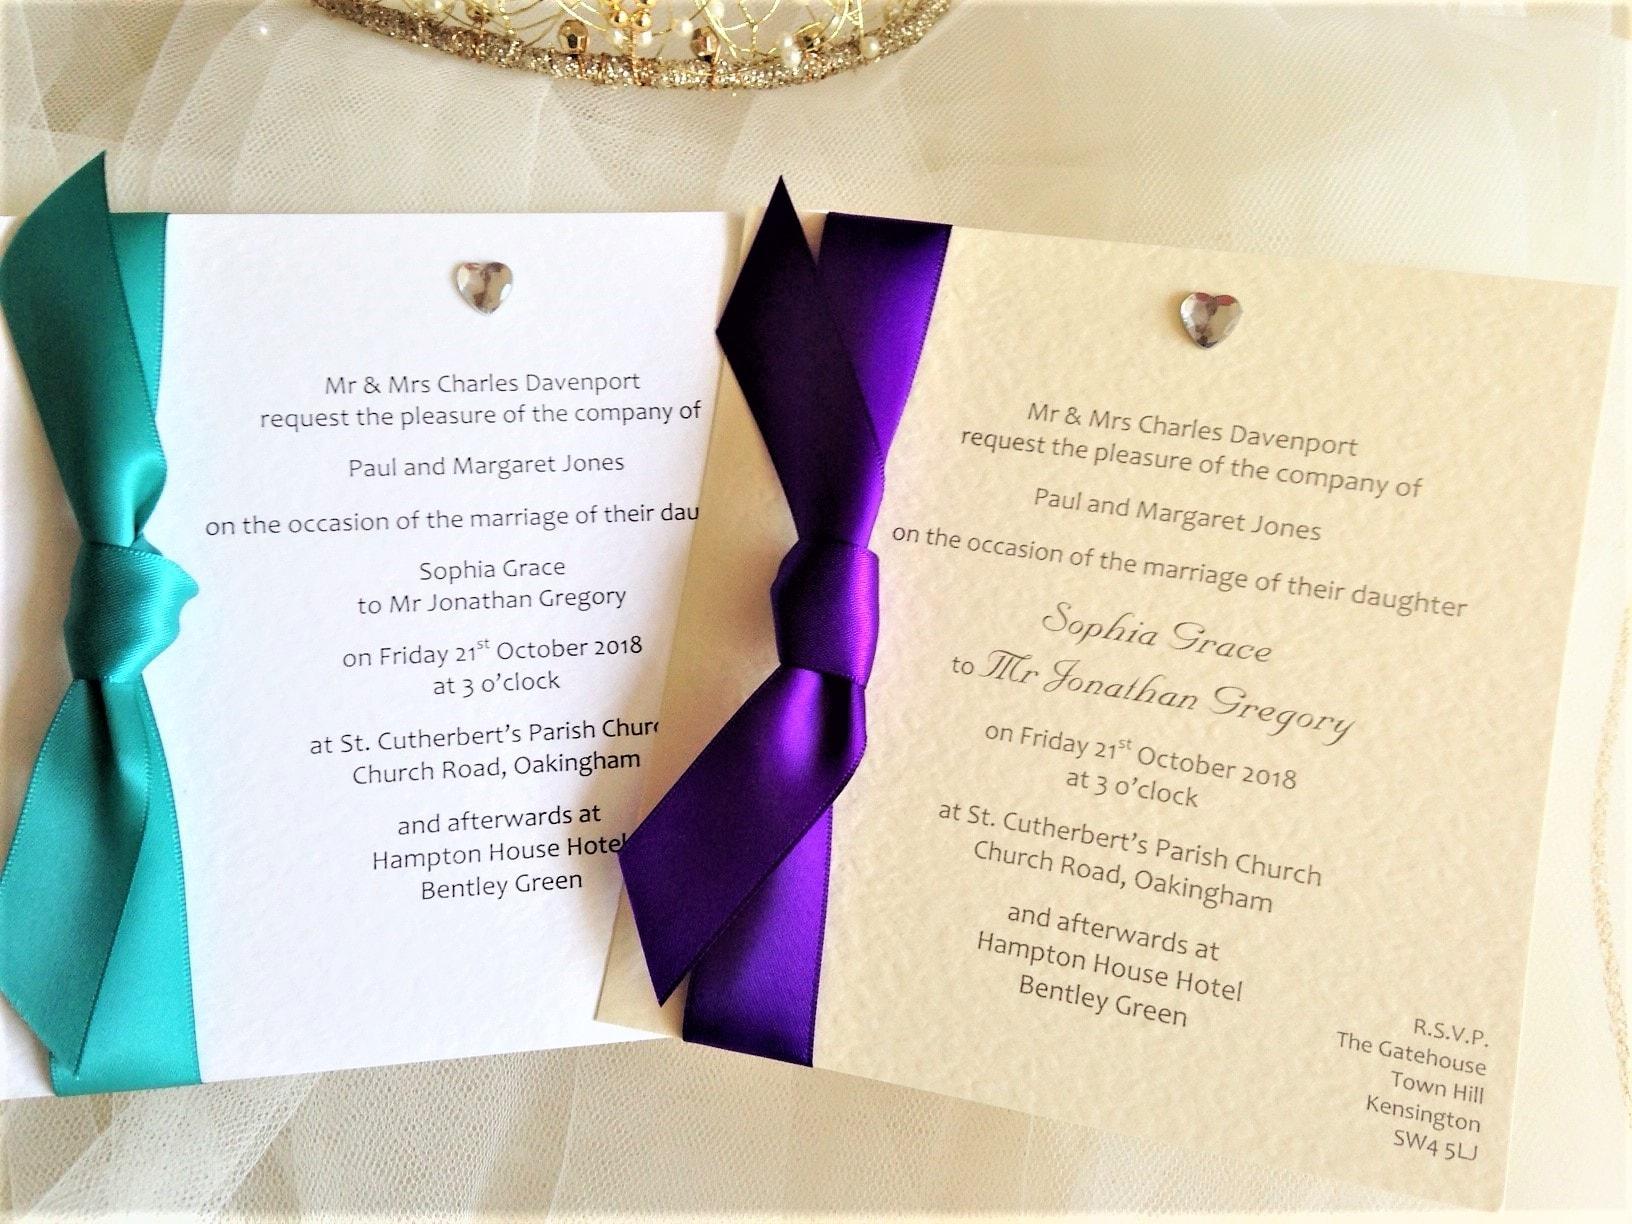 Heart Wedding Invitations Uk: Diamante Heart Square Flat Wedding Invitations